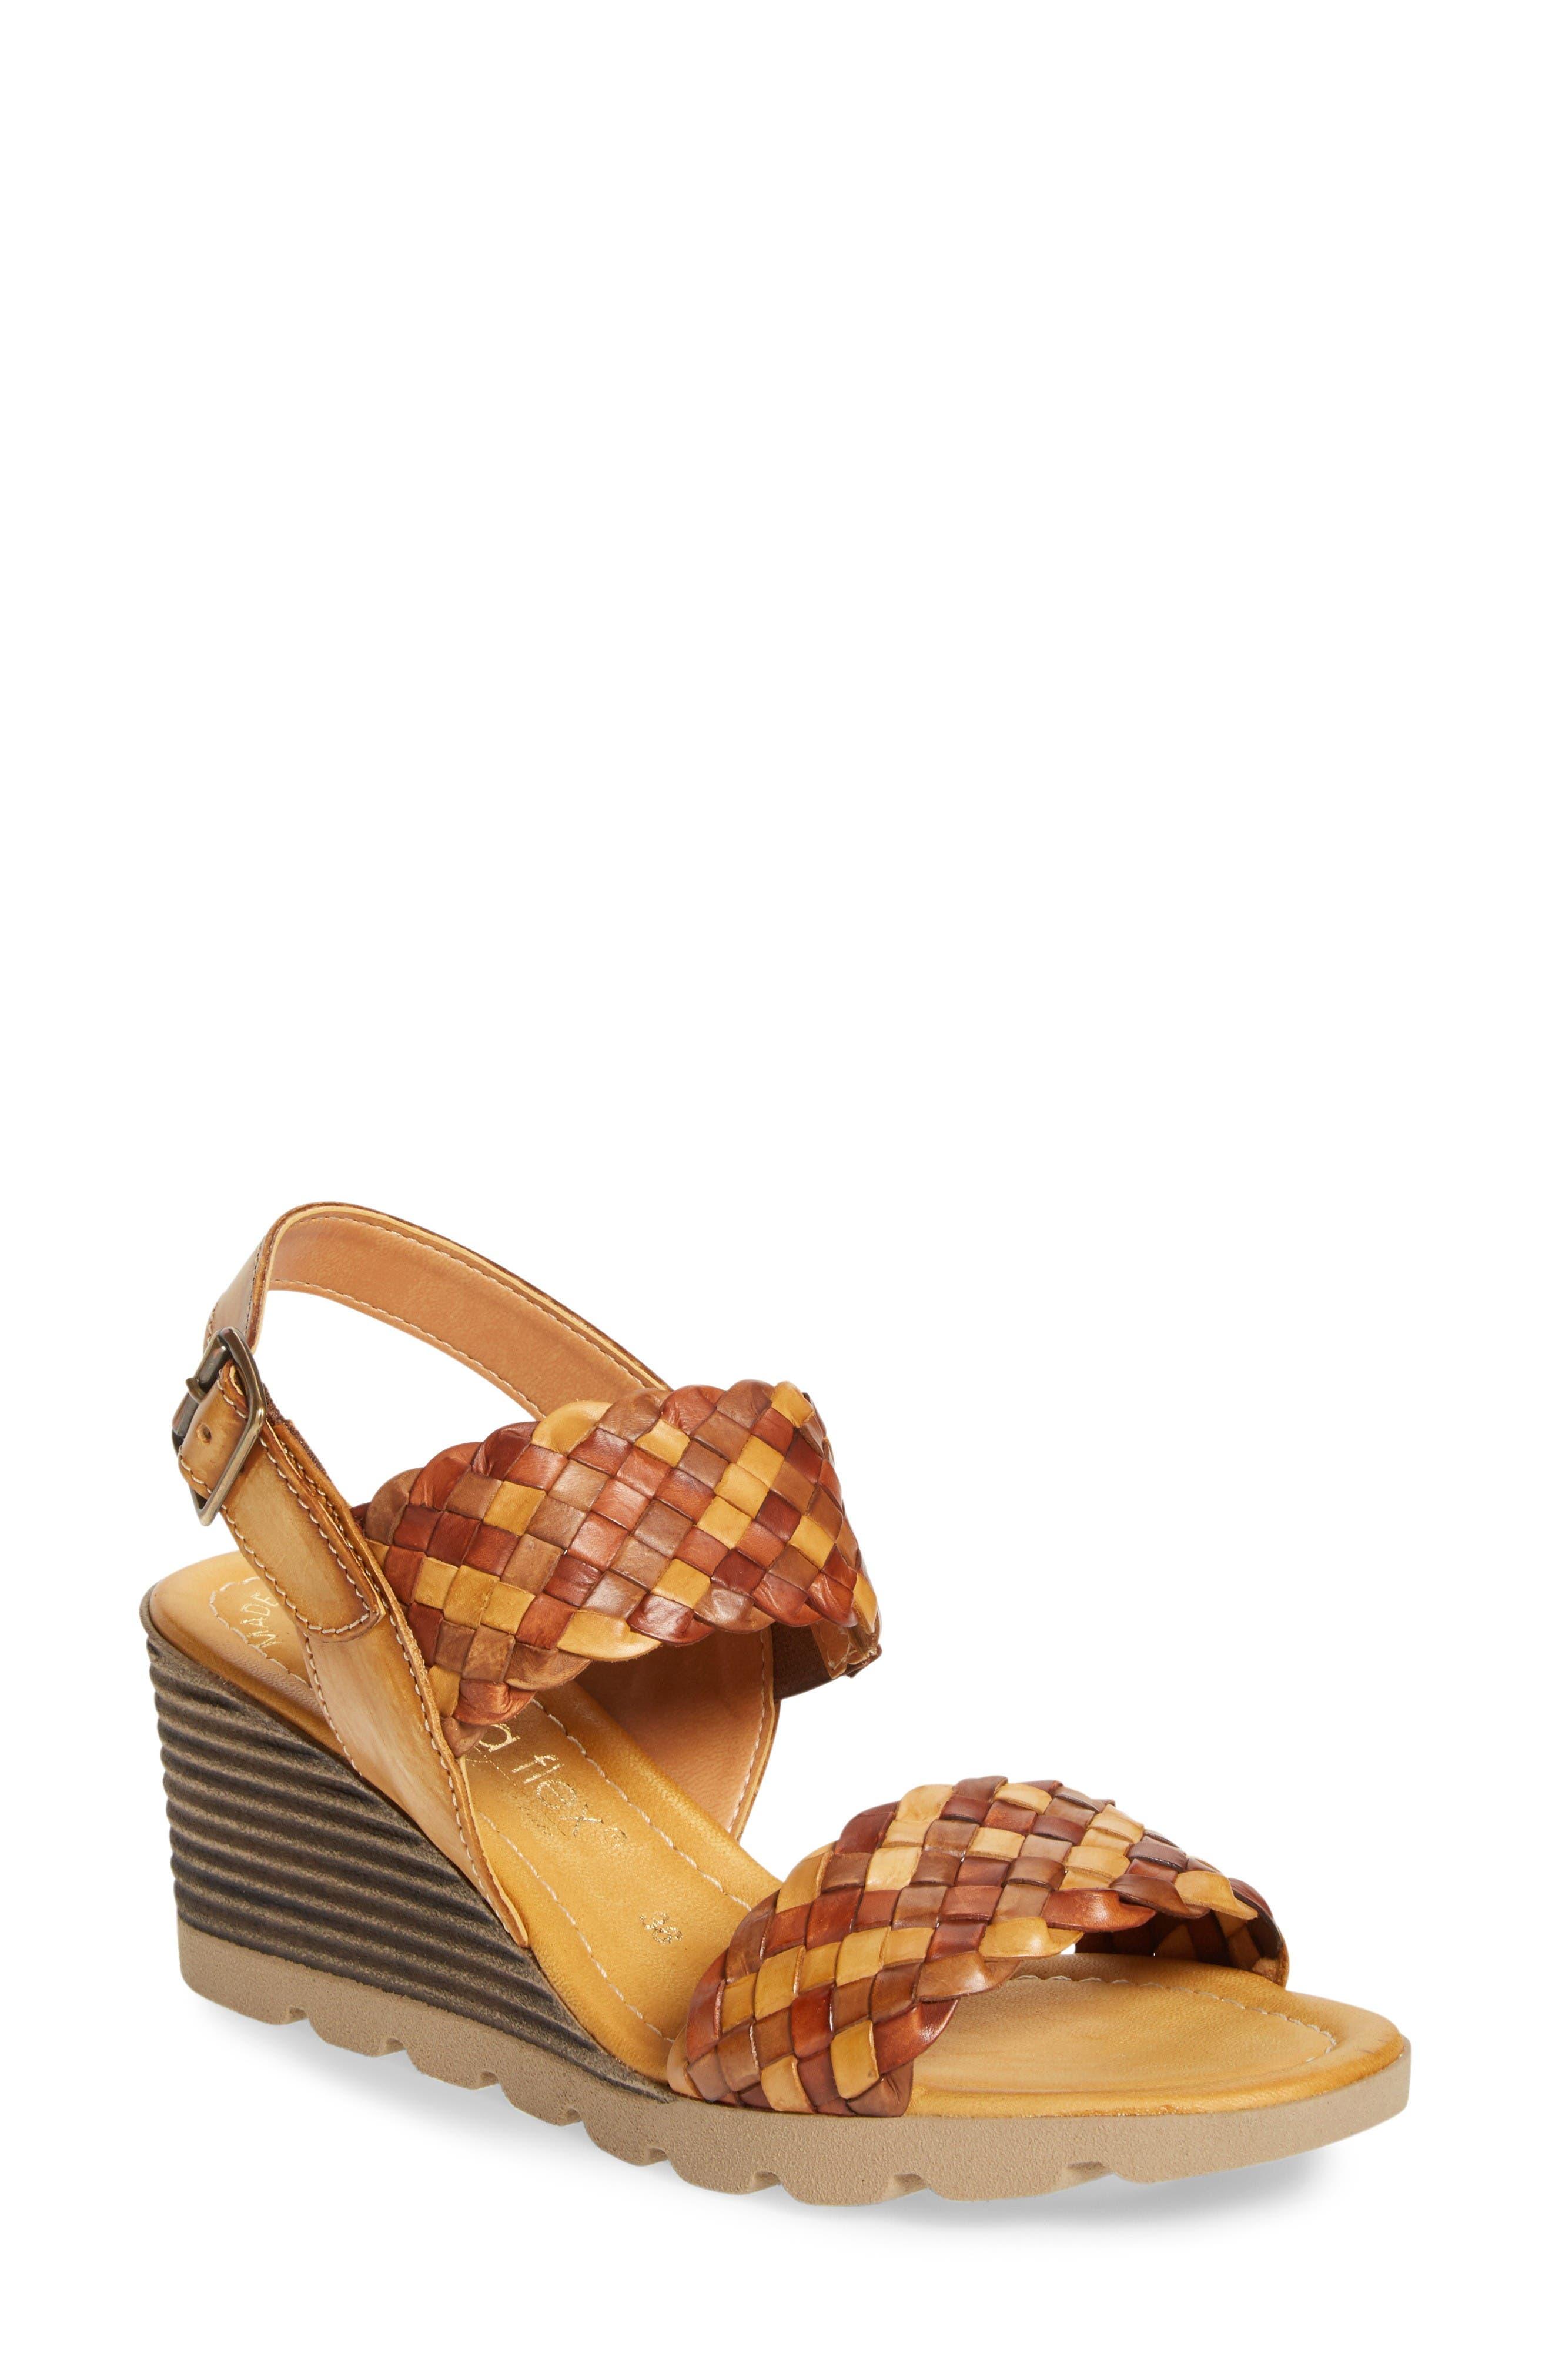 Main Image - Napa Flex Cool Wedge Sandal (Women)